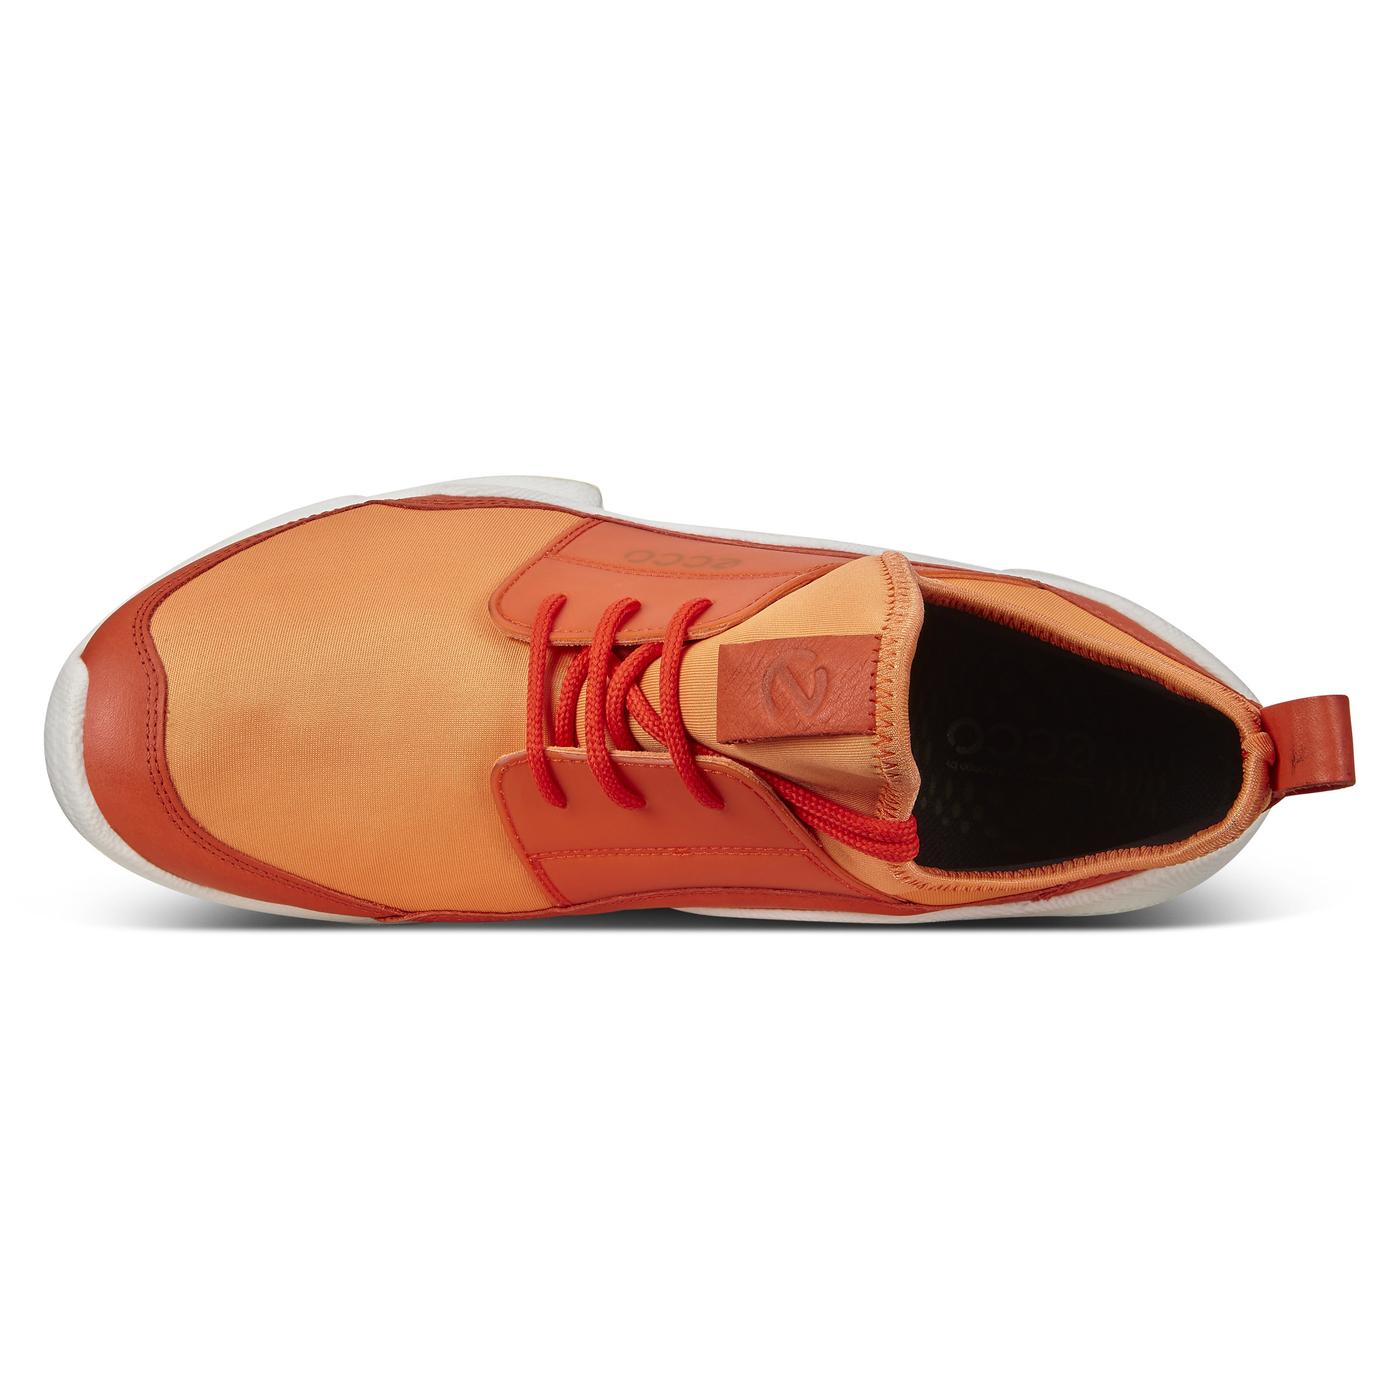 ECCO BIOM C - MEN'S Shoe